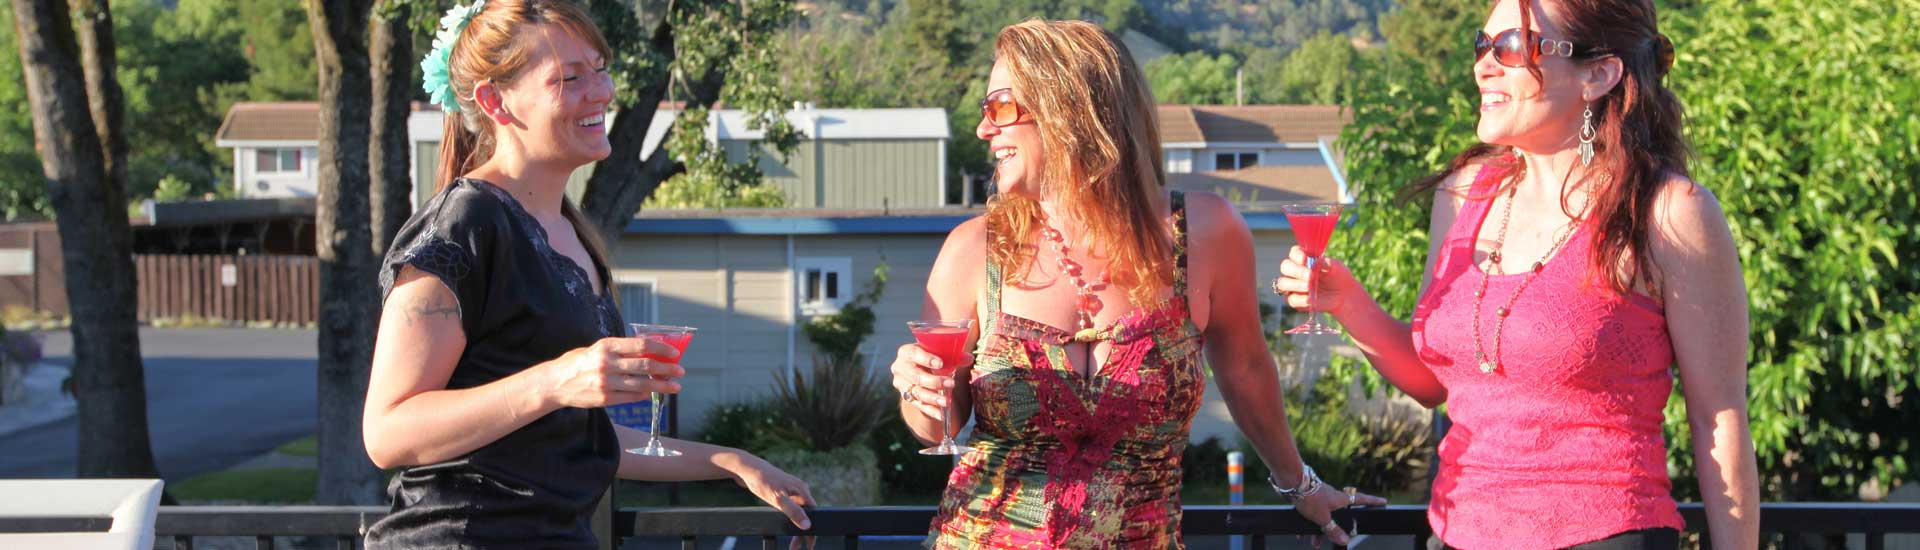 Girlfriends spa getaway reservation request at calistoga for Best girlfriend spa getaways